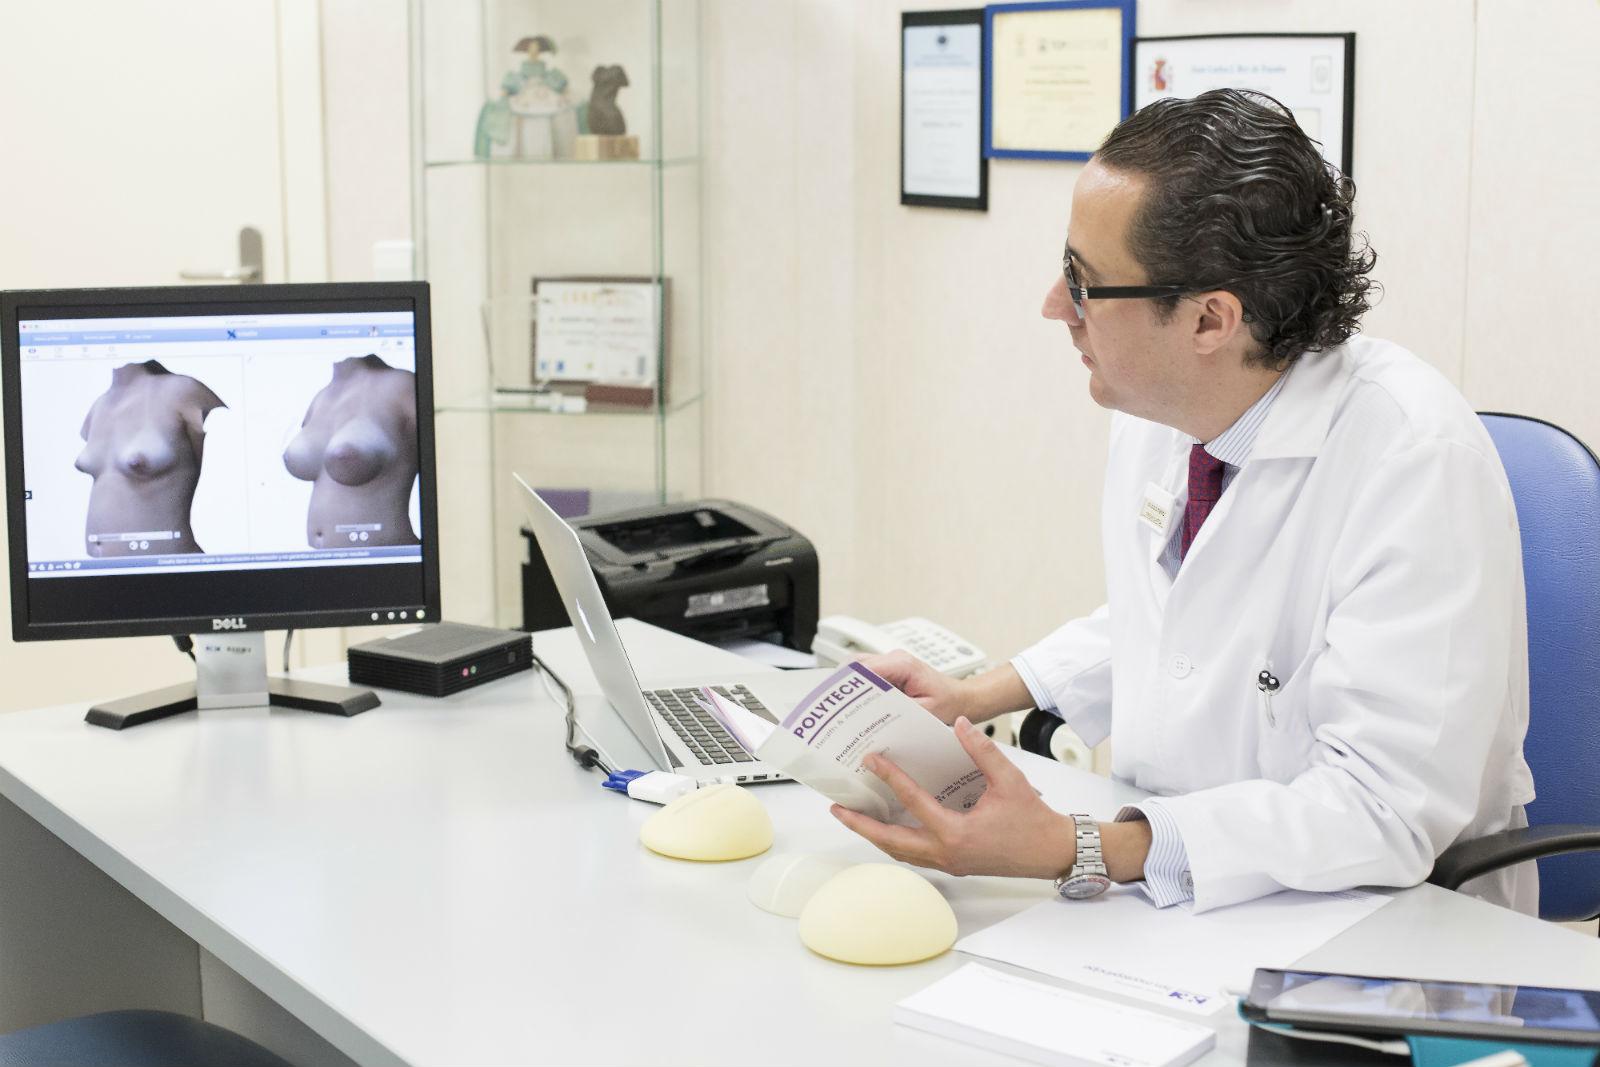 recambio-implante-mamario-cirujano-plastico-madrid